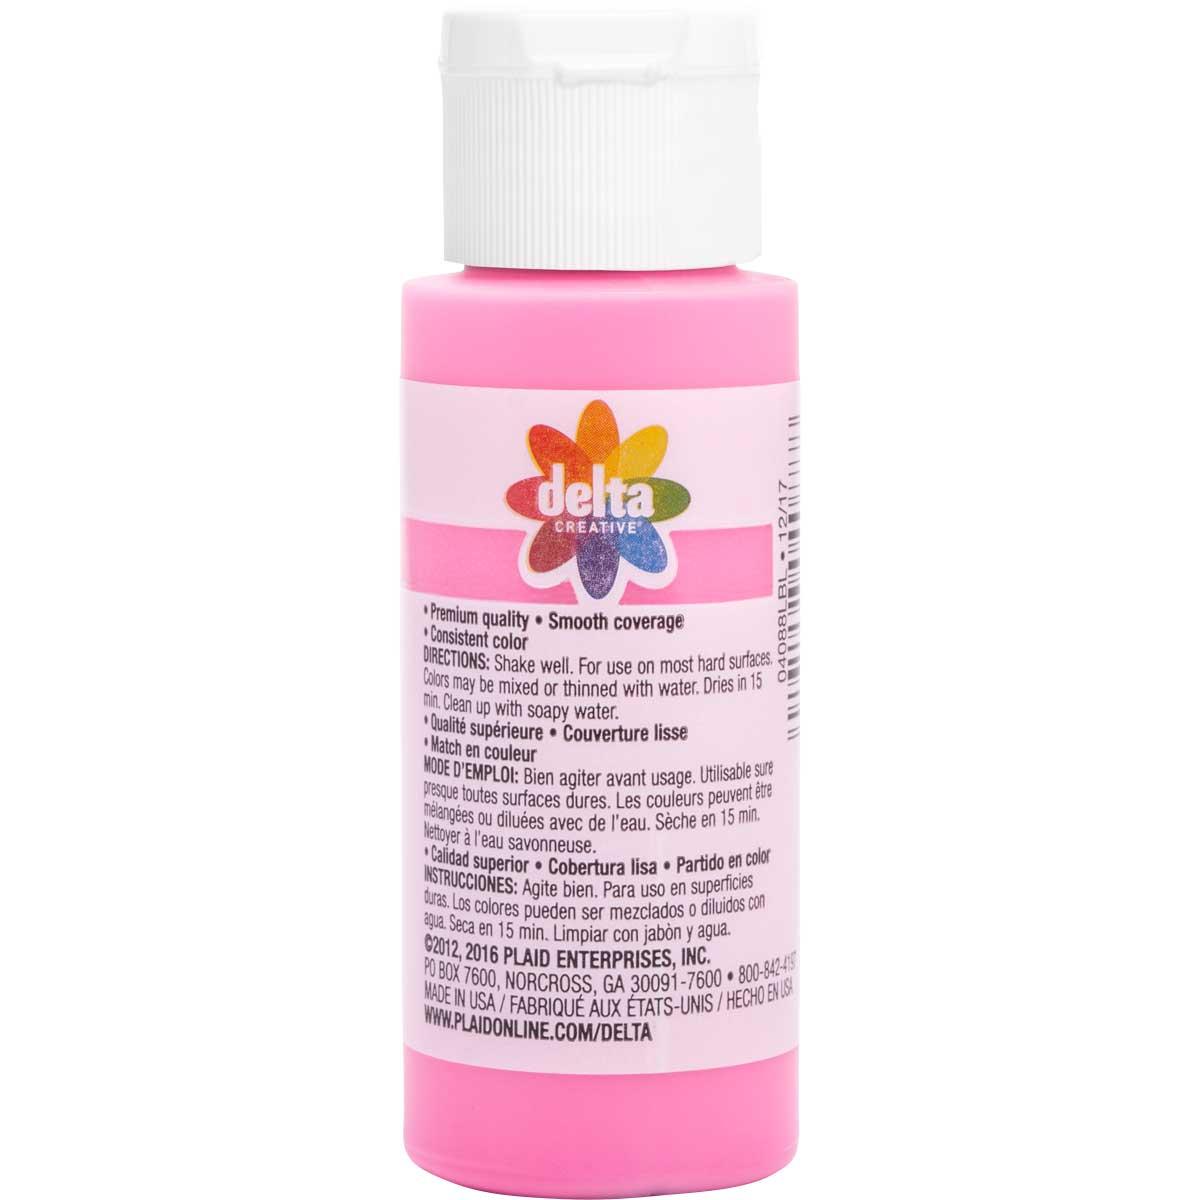 Delta Ceramcoat ® Acrylic Paint - Chic Pink, 2 oz.